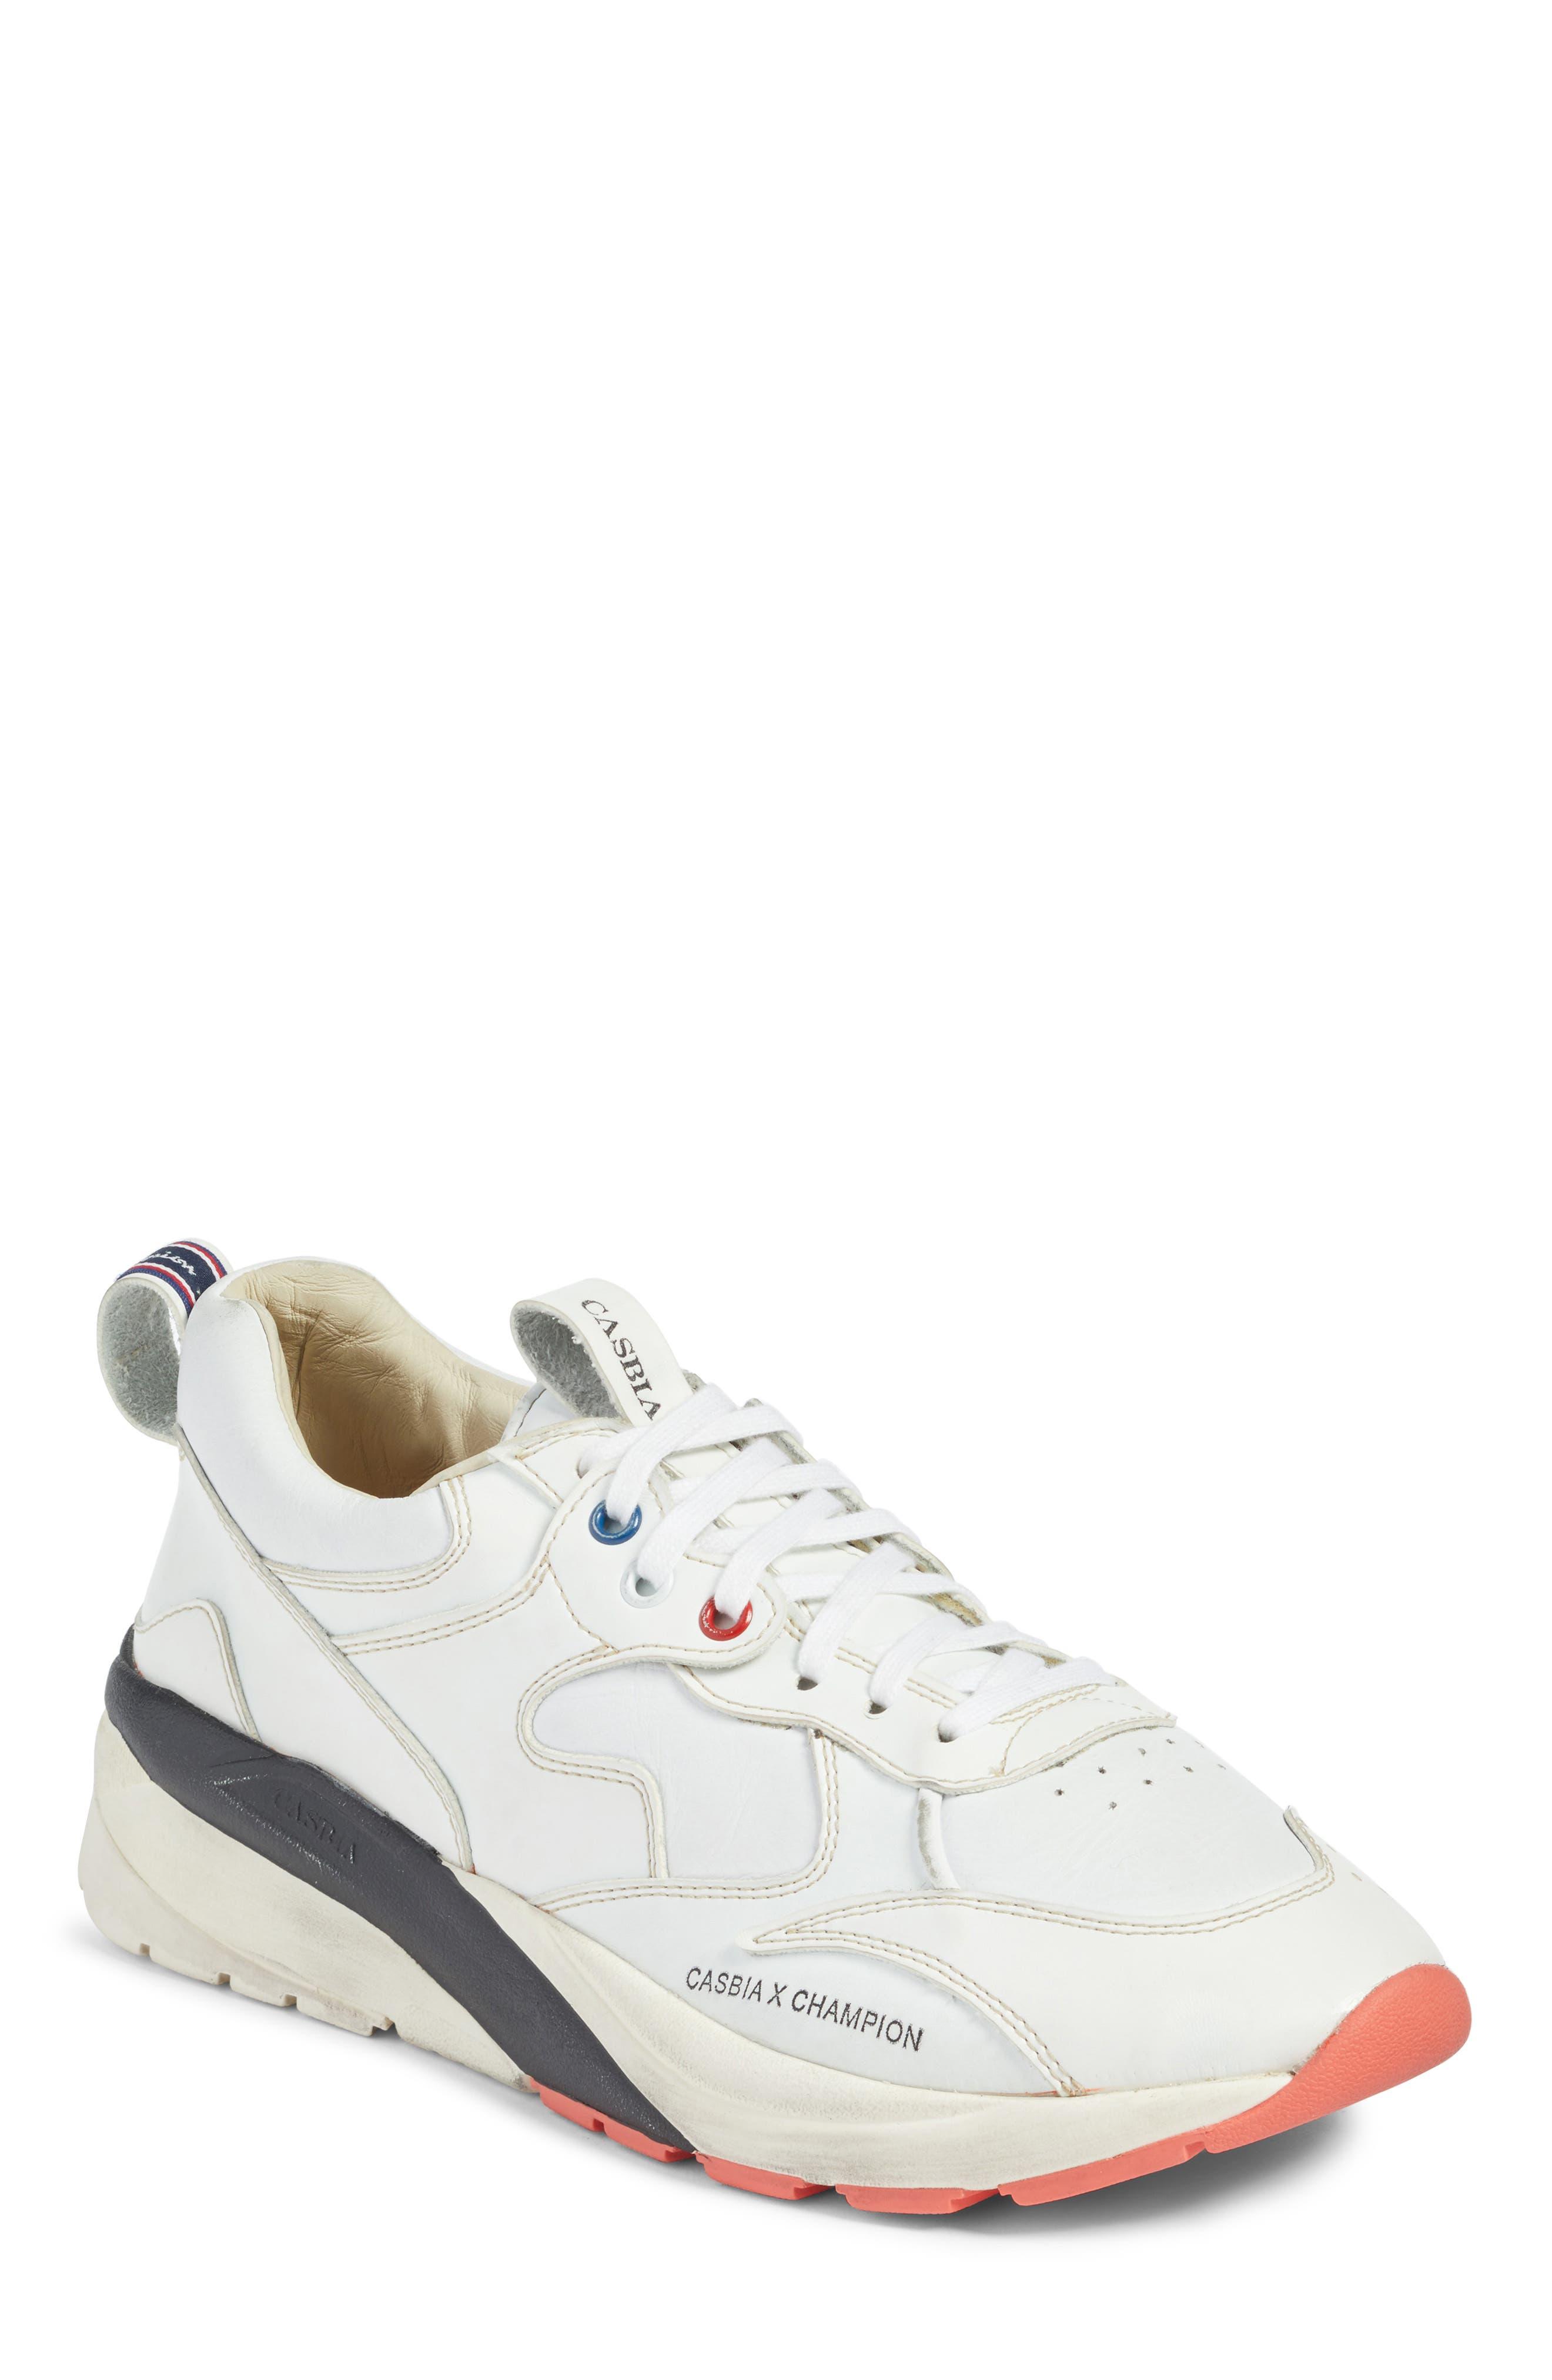 Champion Veloce ATL Sneaker,                             Main thumbnail 1, color,                             White Leather